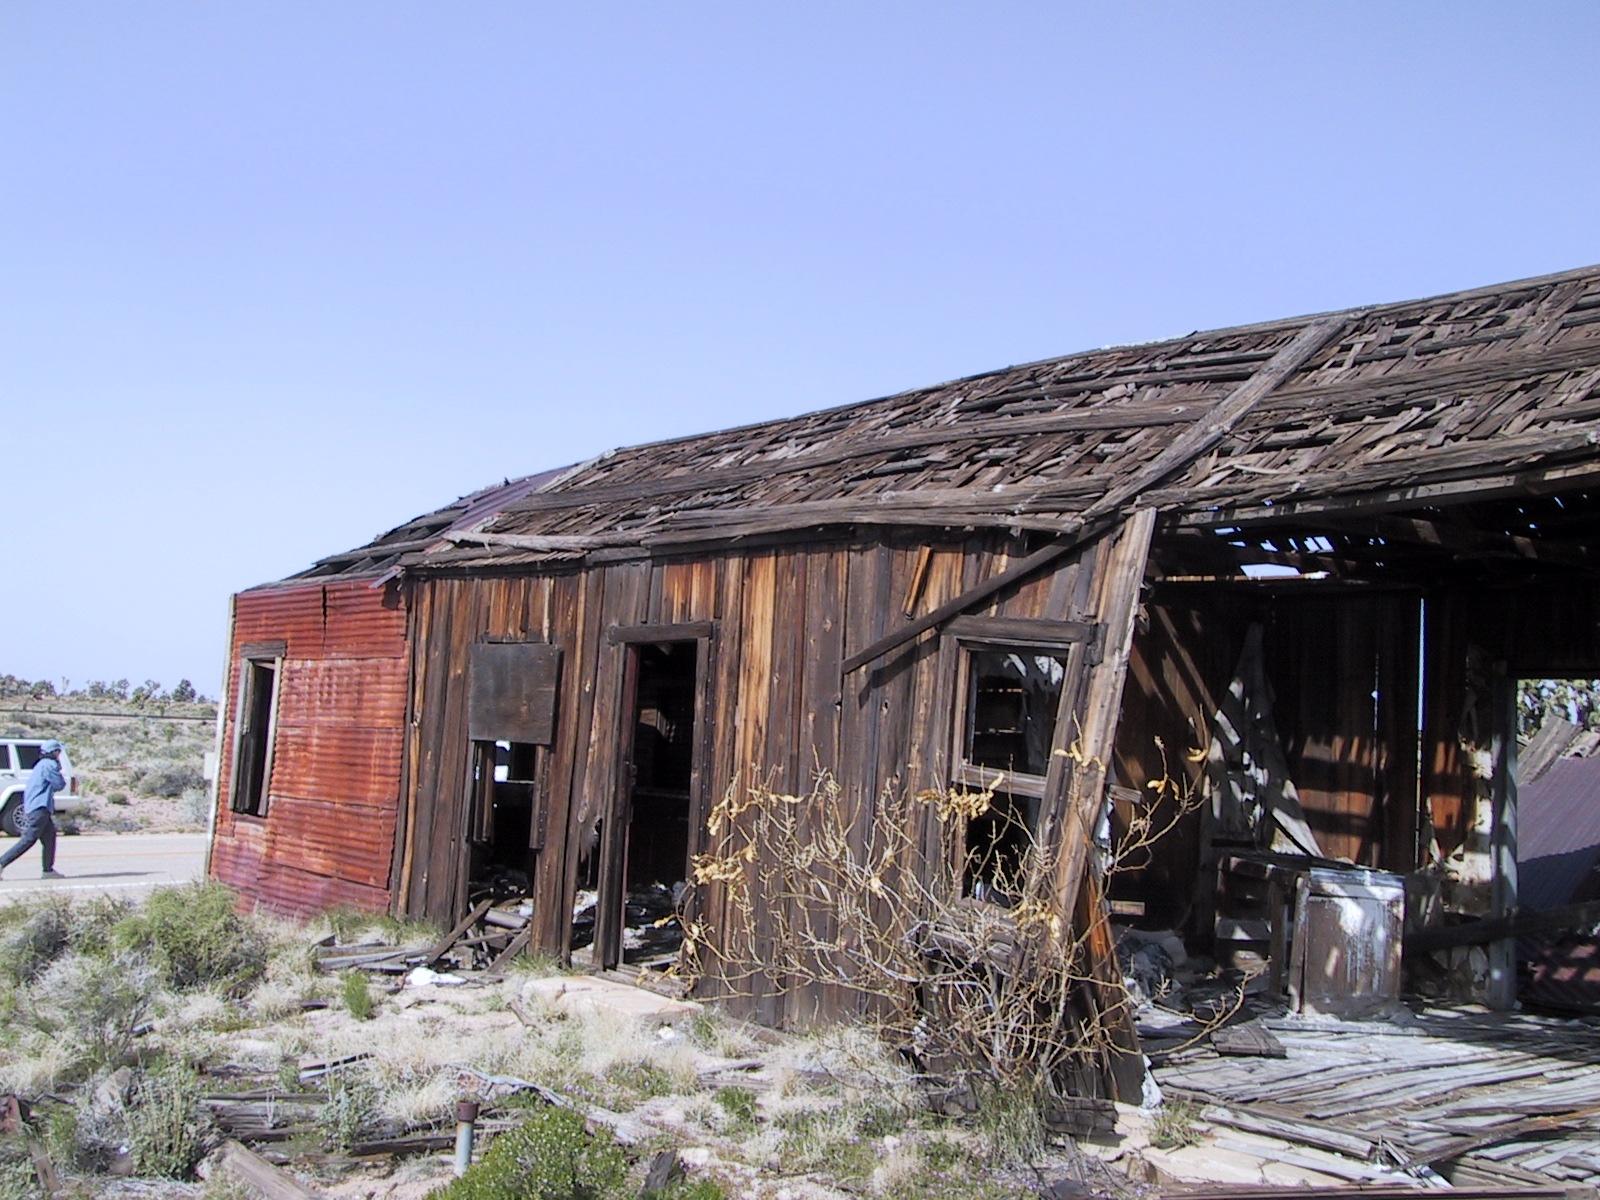 Cima General Store. It is in slight disrepair